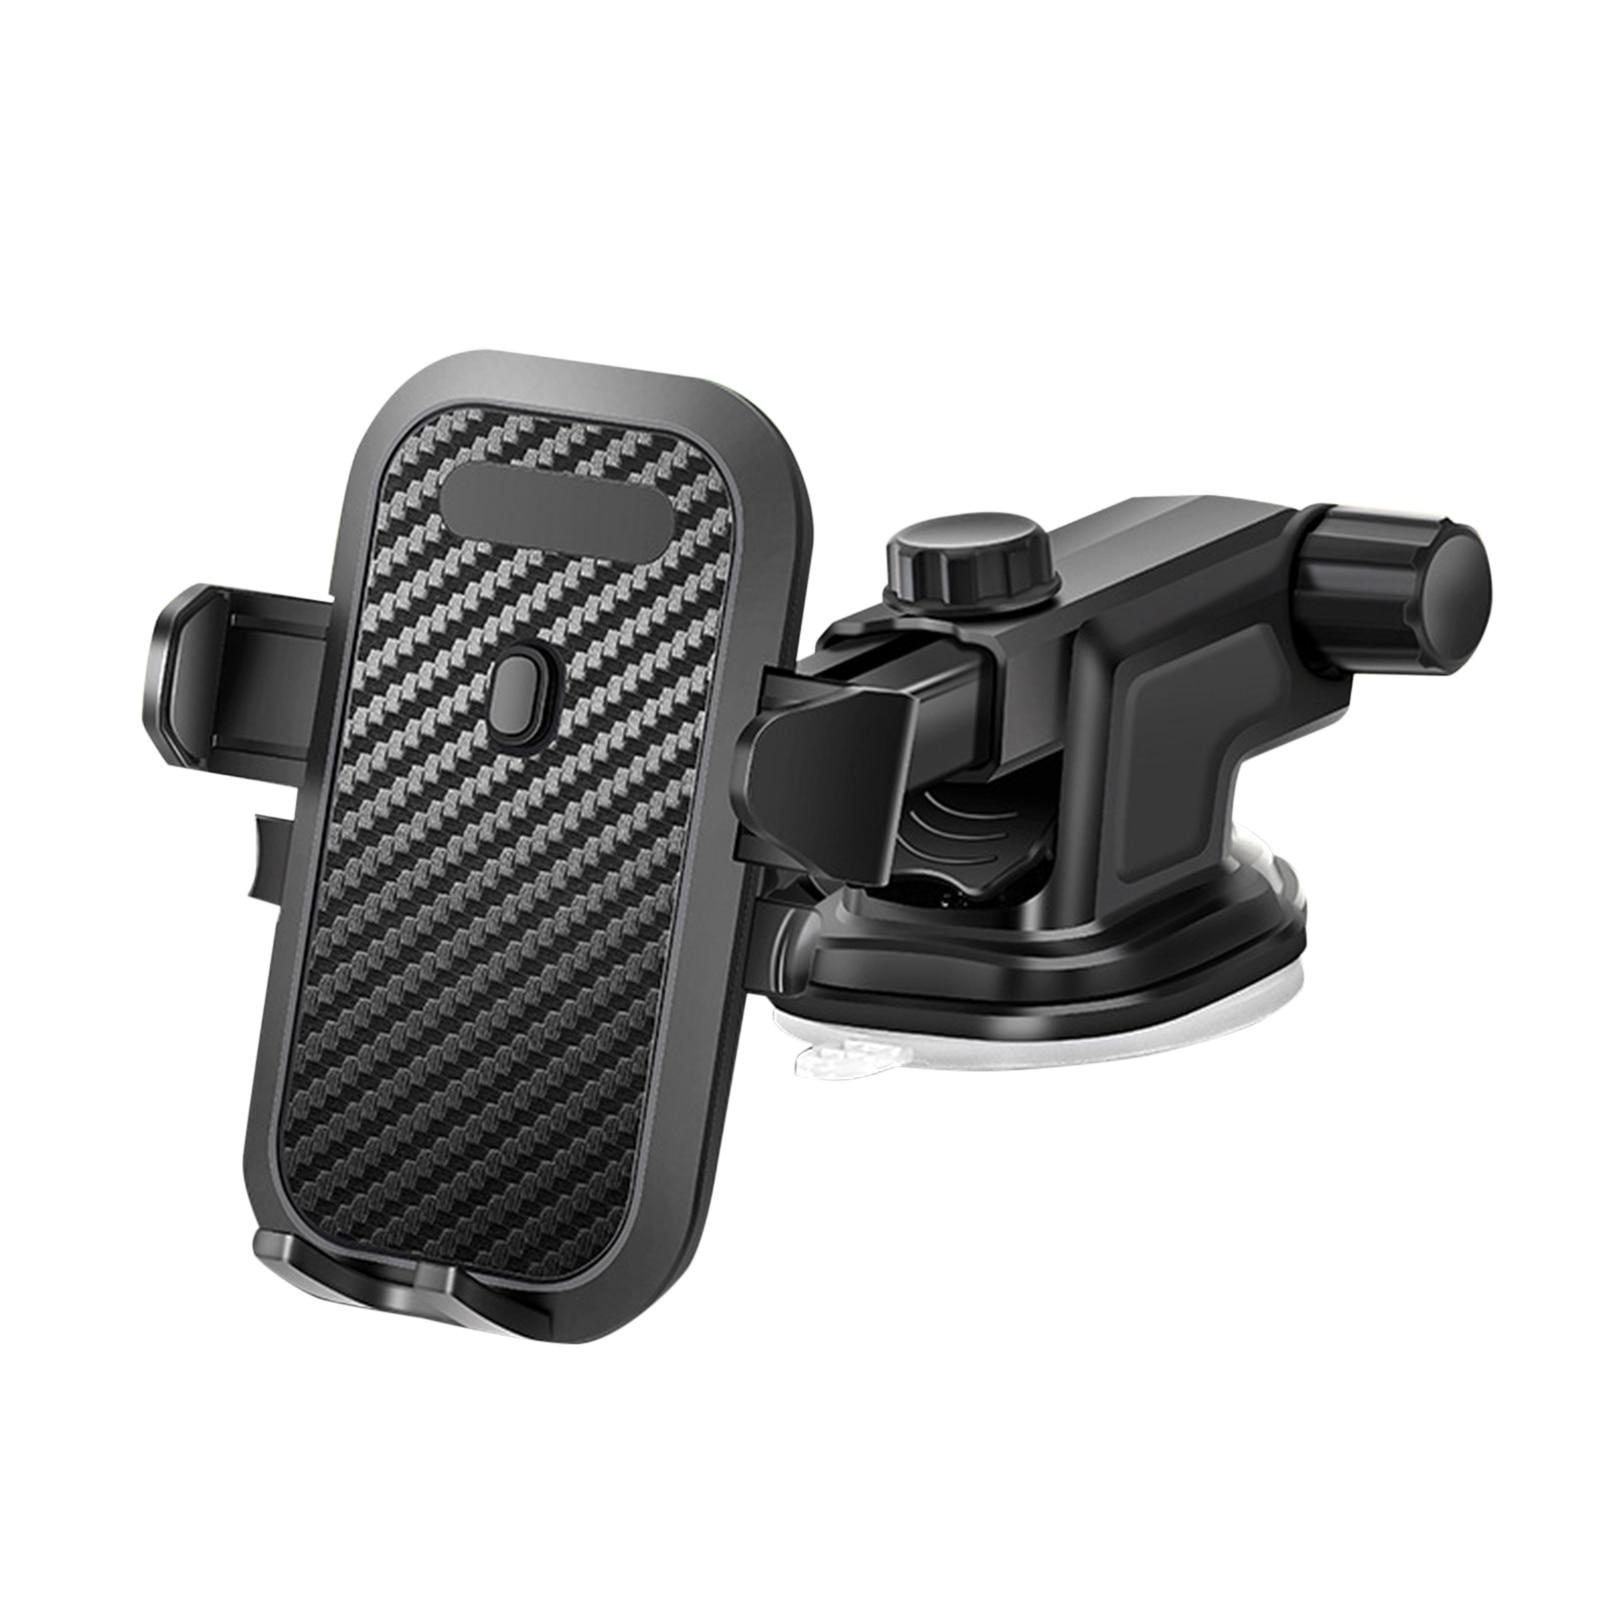 Car Suction Cup Mobile Phone Holder Navigation Bracket 360 Degree Rotation Car Telescopic Mobile Pho